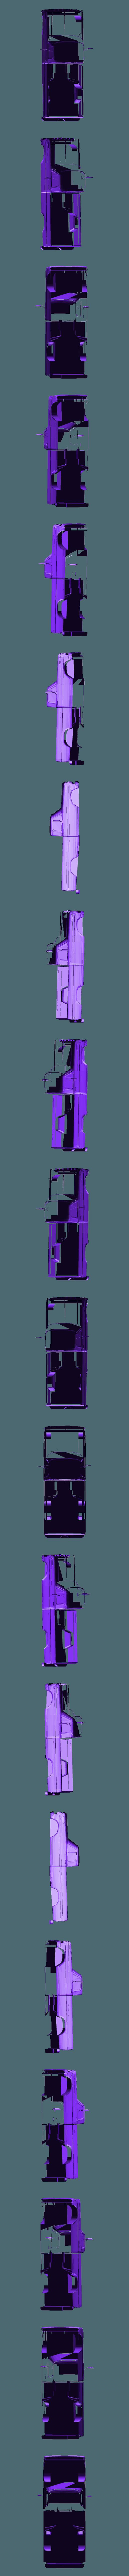 ford2f100.stl Download free STL file FORD_F100 • Design to 3D print, Santiago90